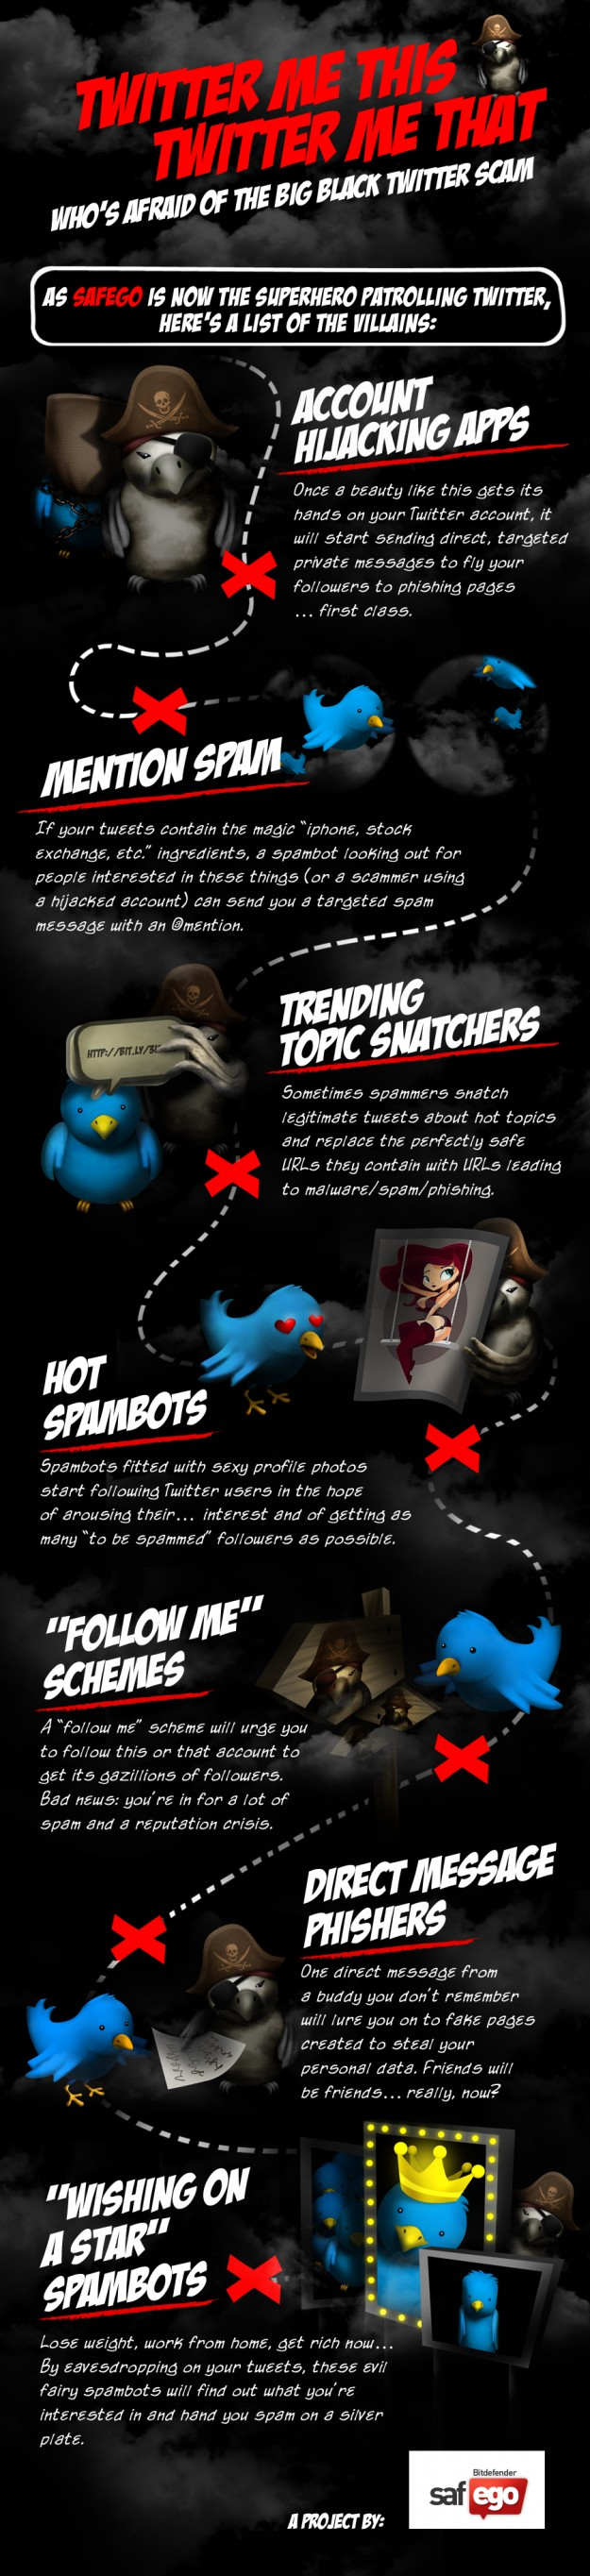 Las 7 plagas de Twitter